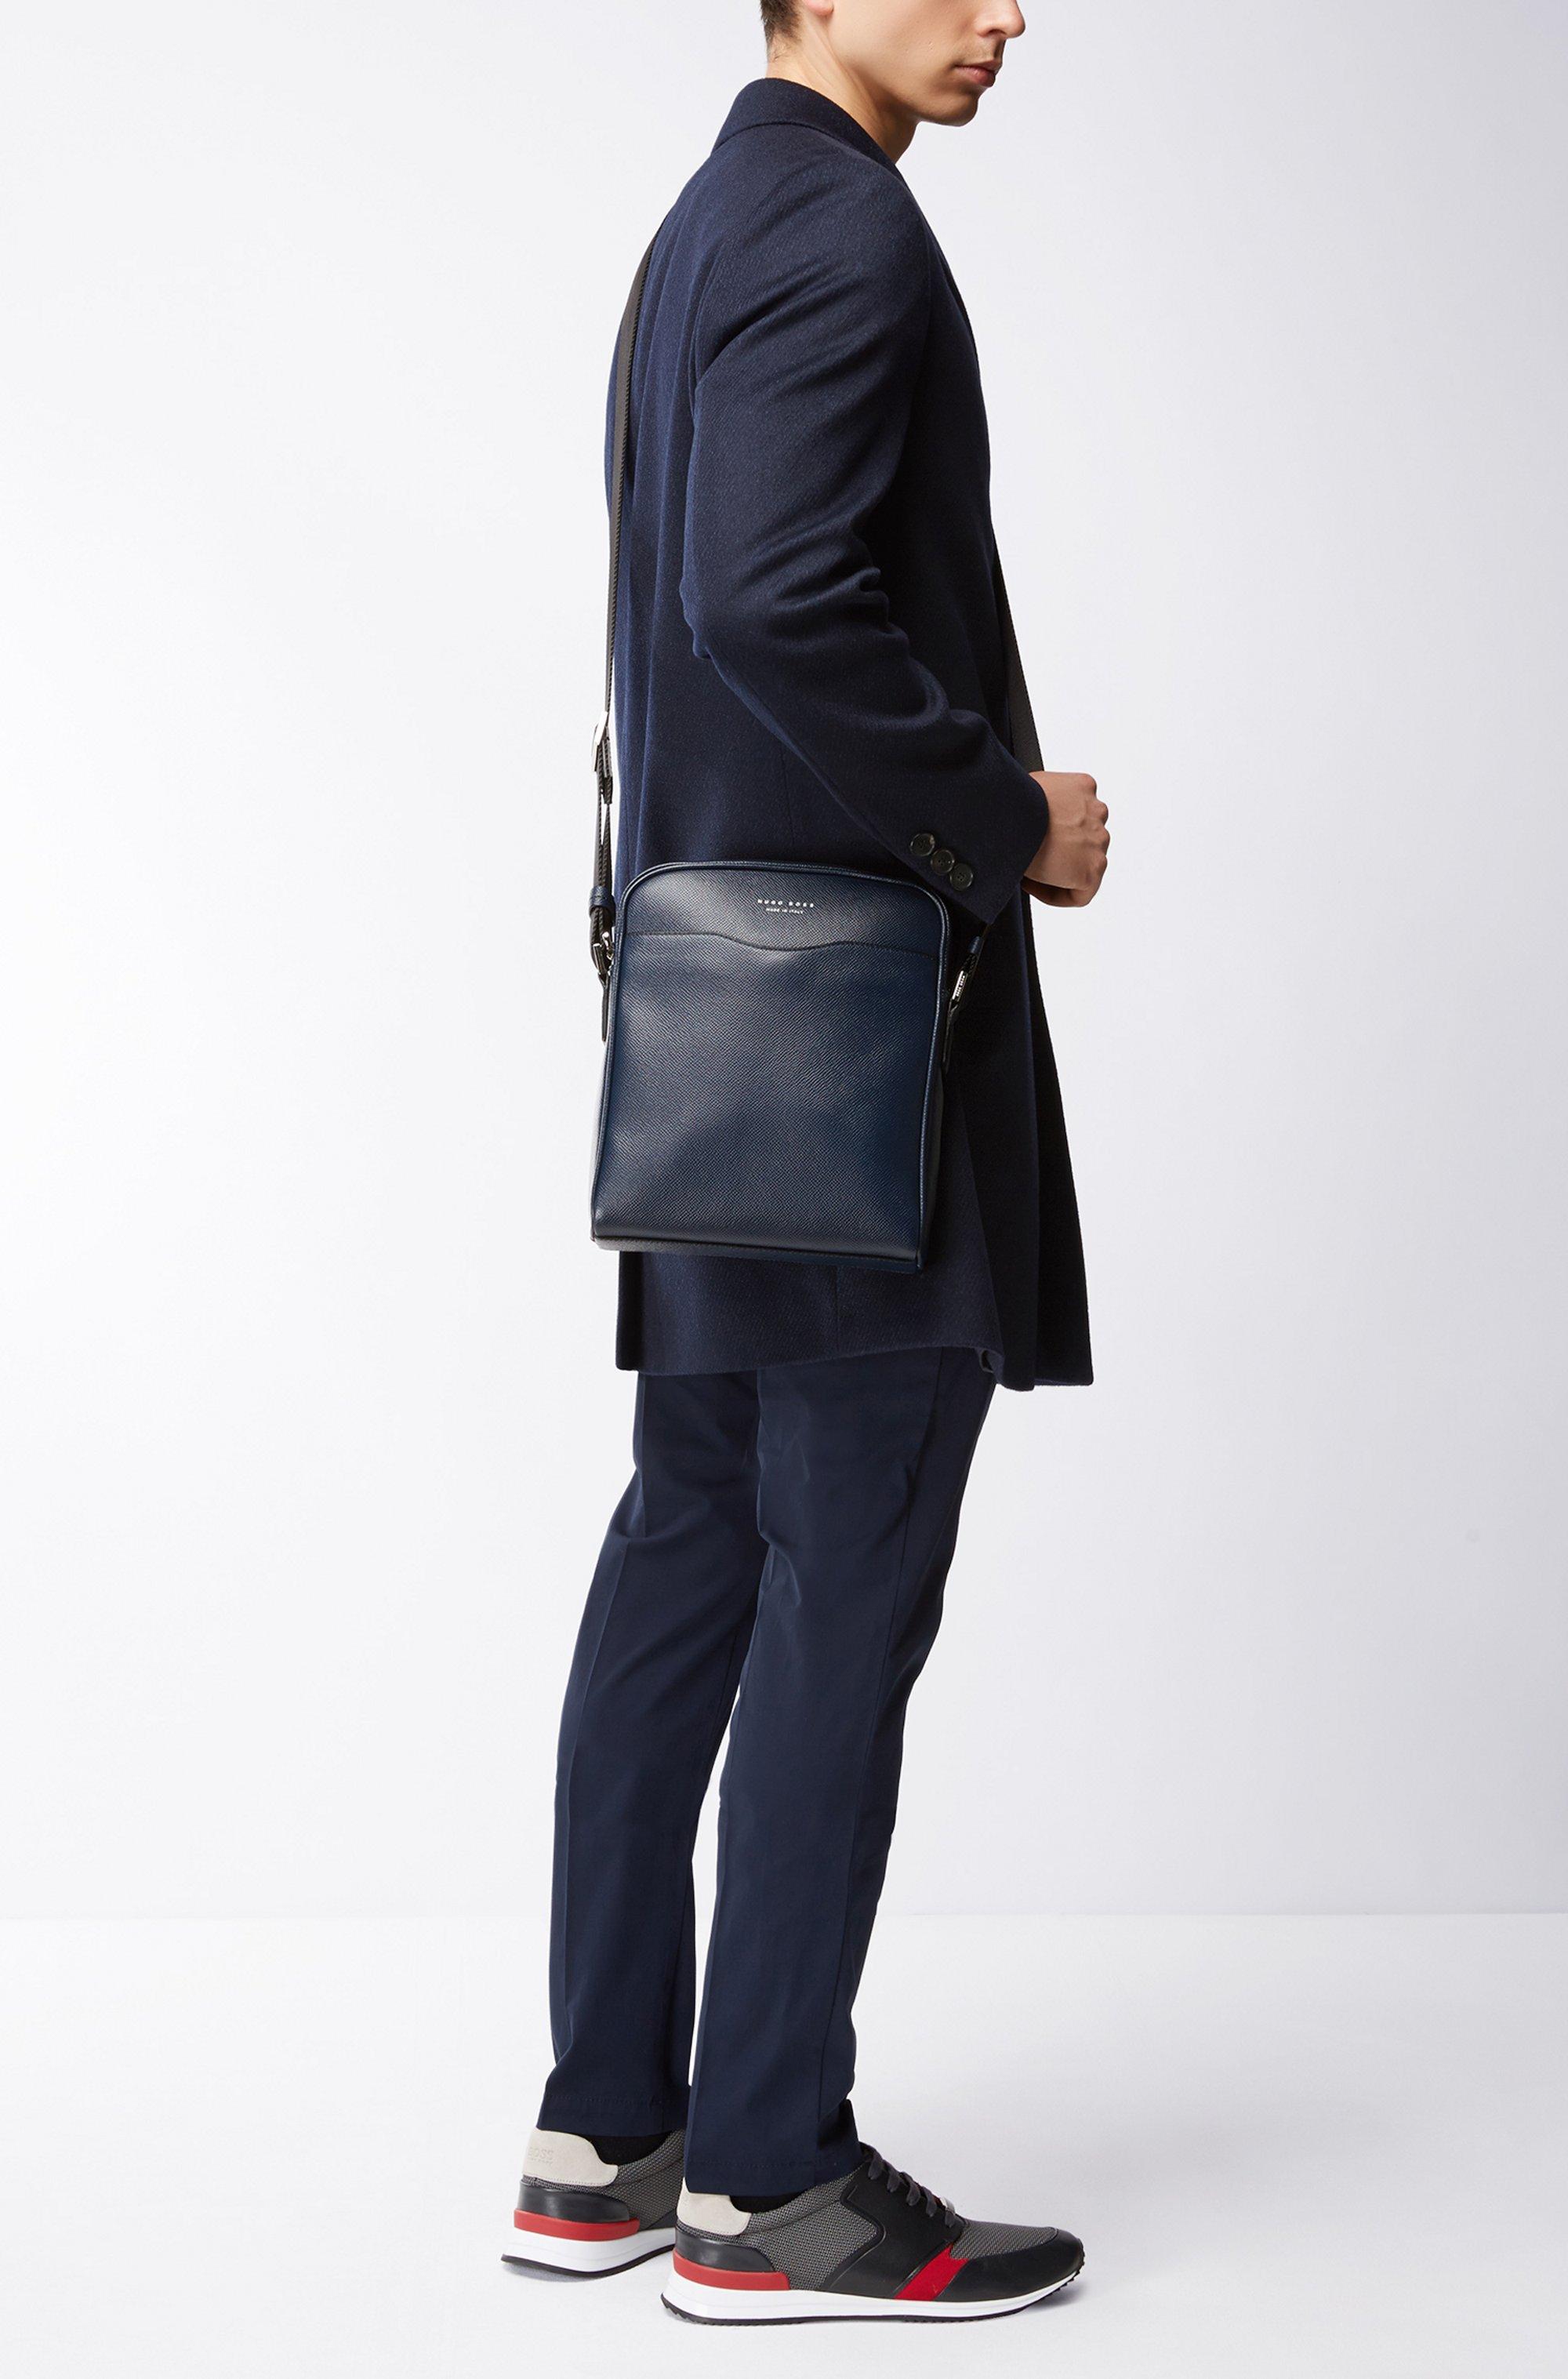 Signature Collection reporter bag in palmellato leather